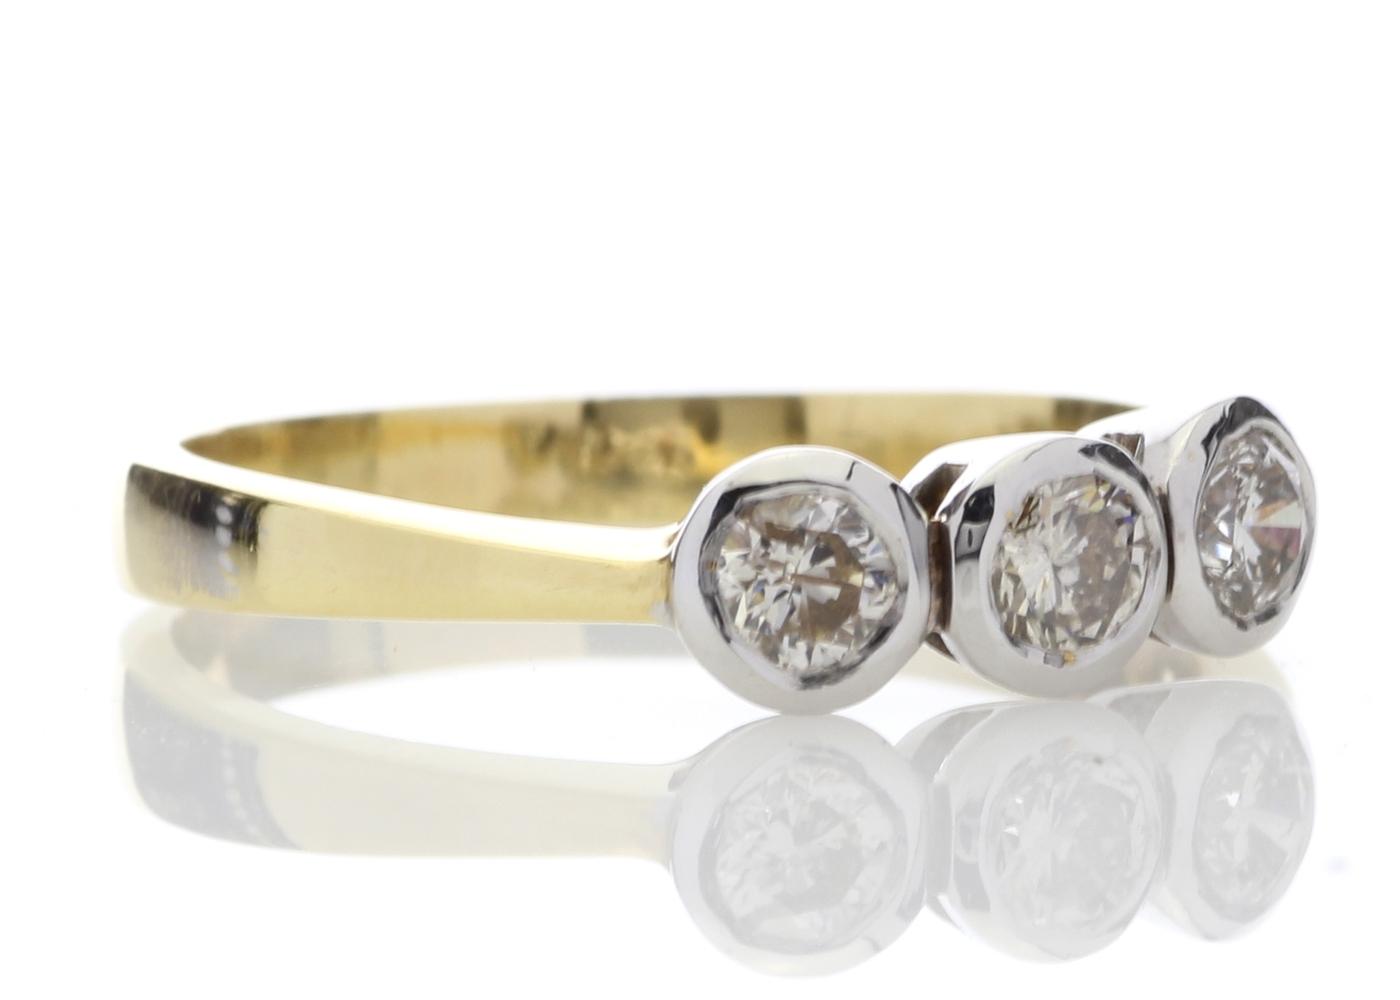 18ct Three Stone Claw Set Diamond Ring 0.75 Carats - Image 4 of 4